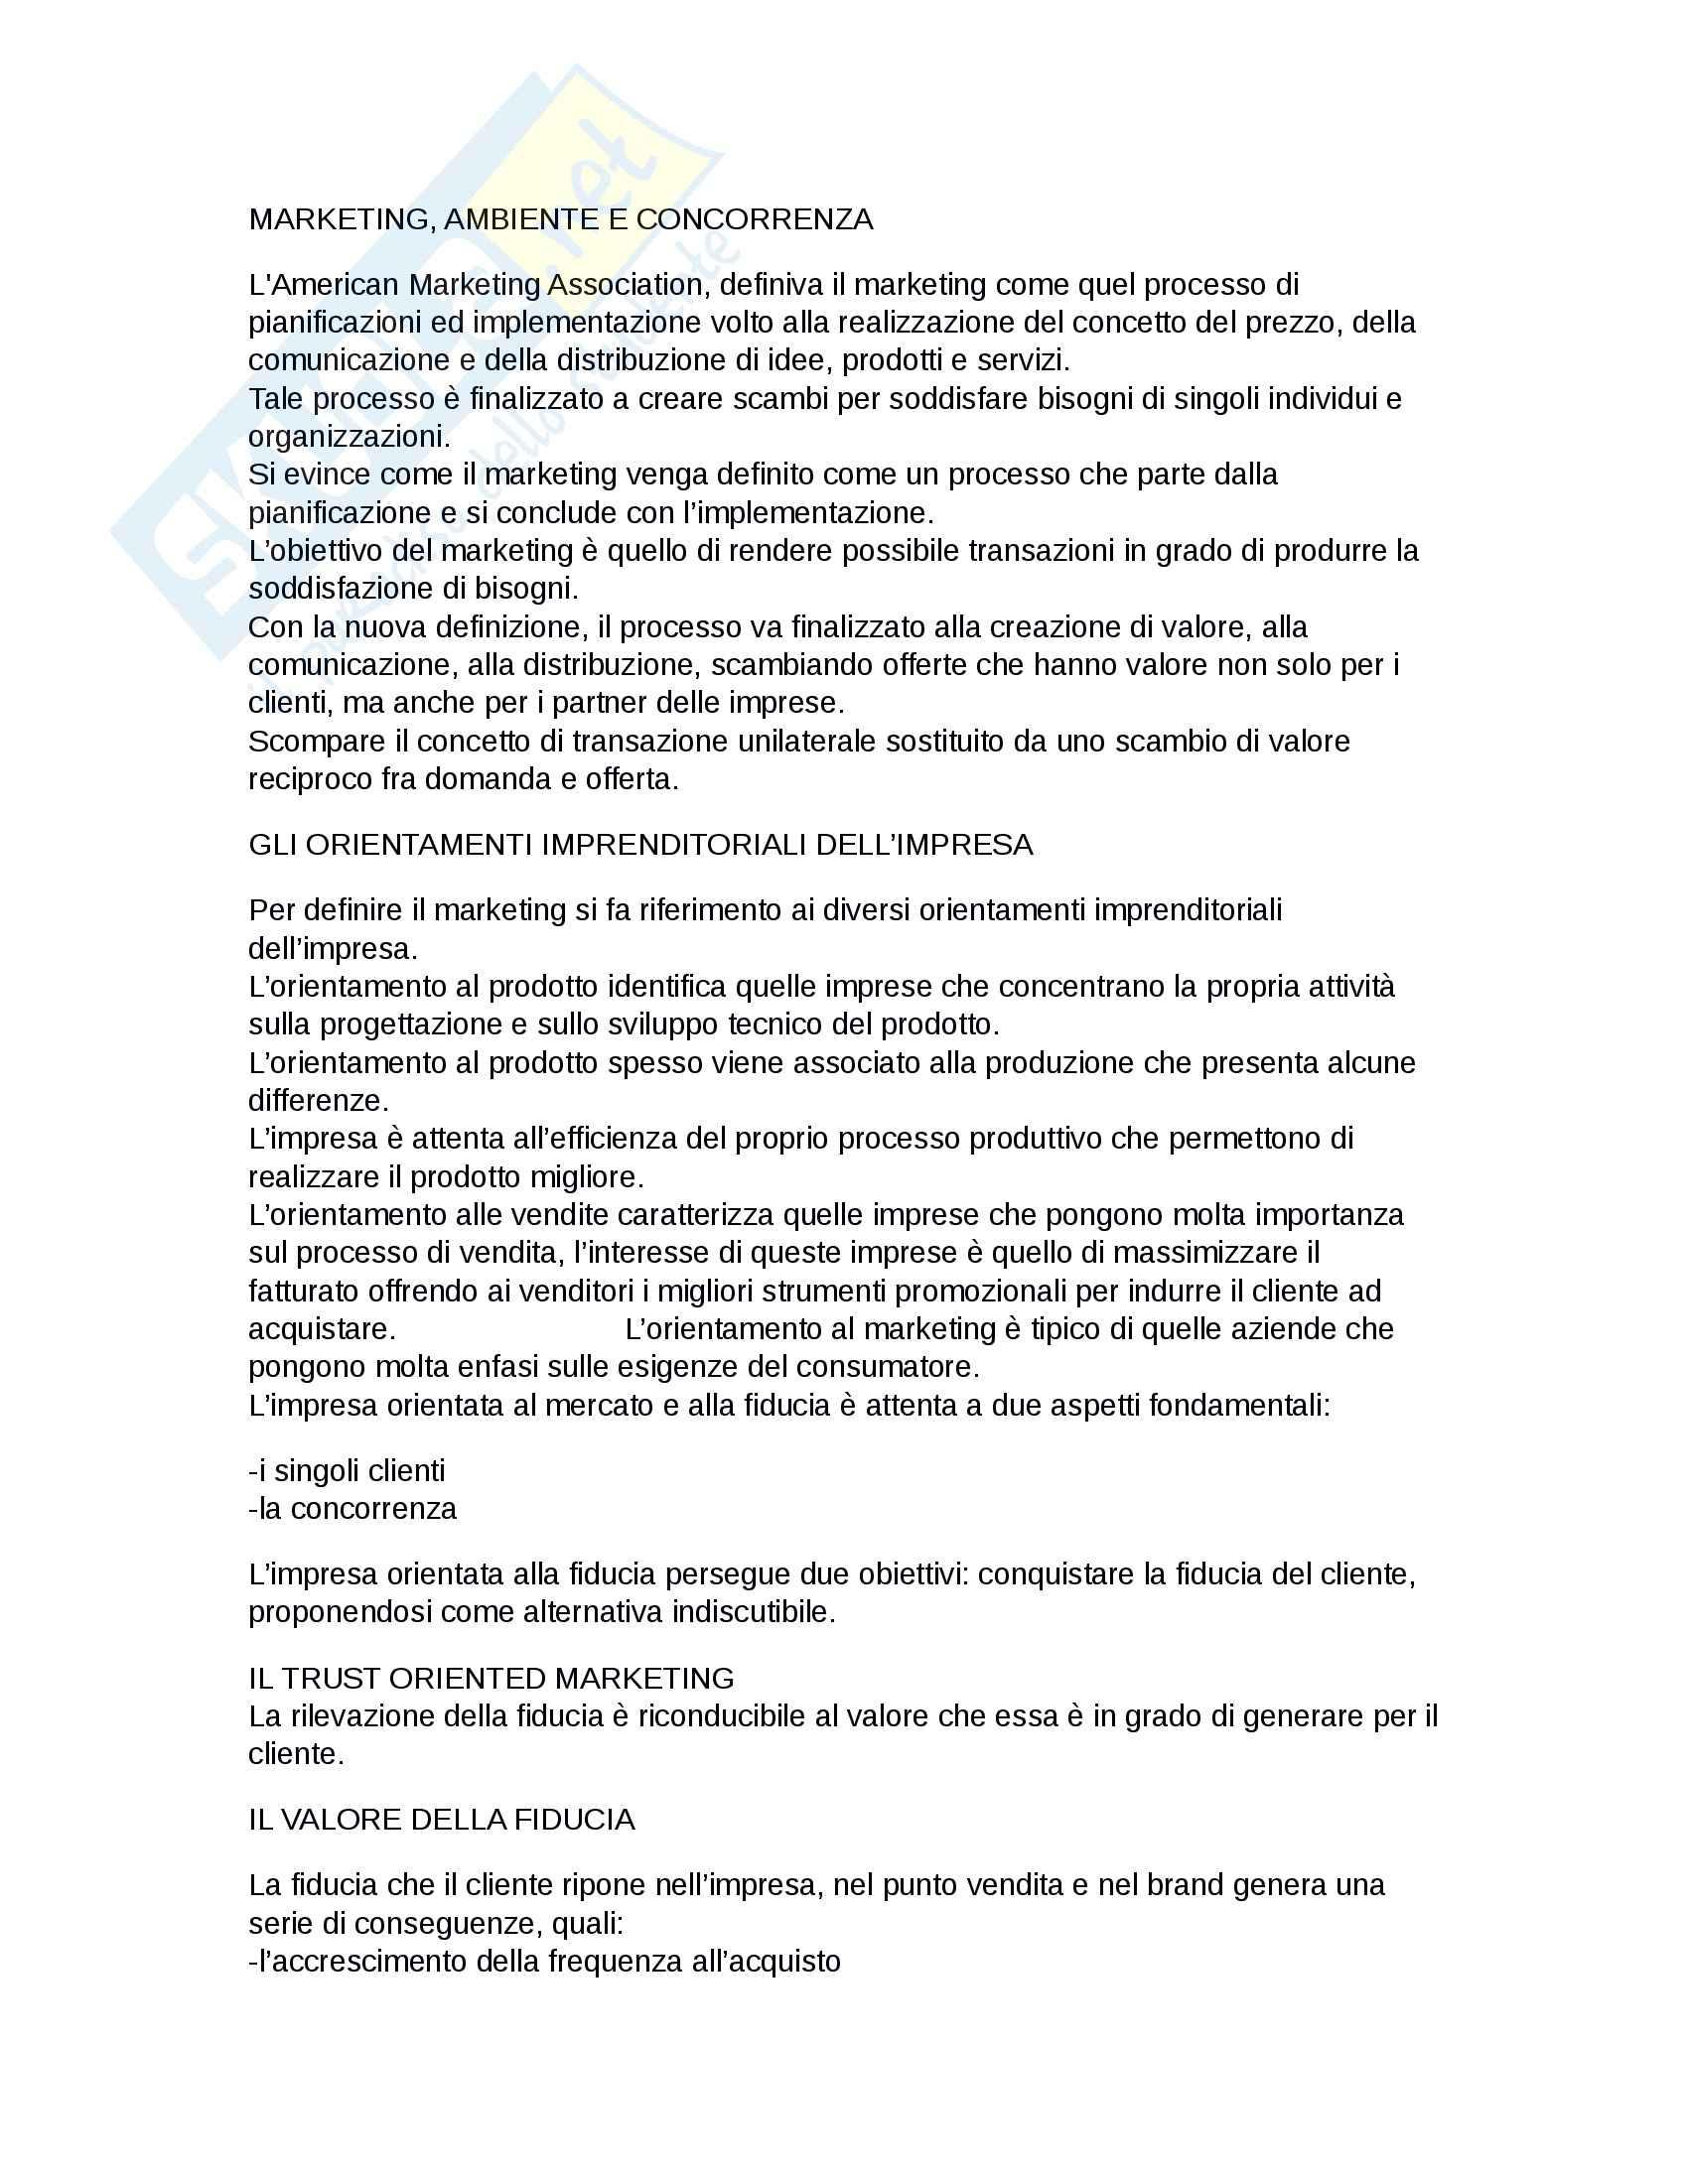 Riassunto esame Marketing, prof. D'Amico, libro consigliato Marketing e fiducia, Castaldo